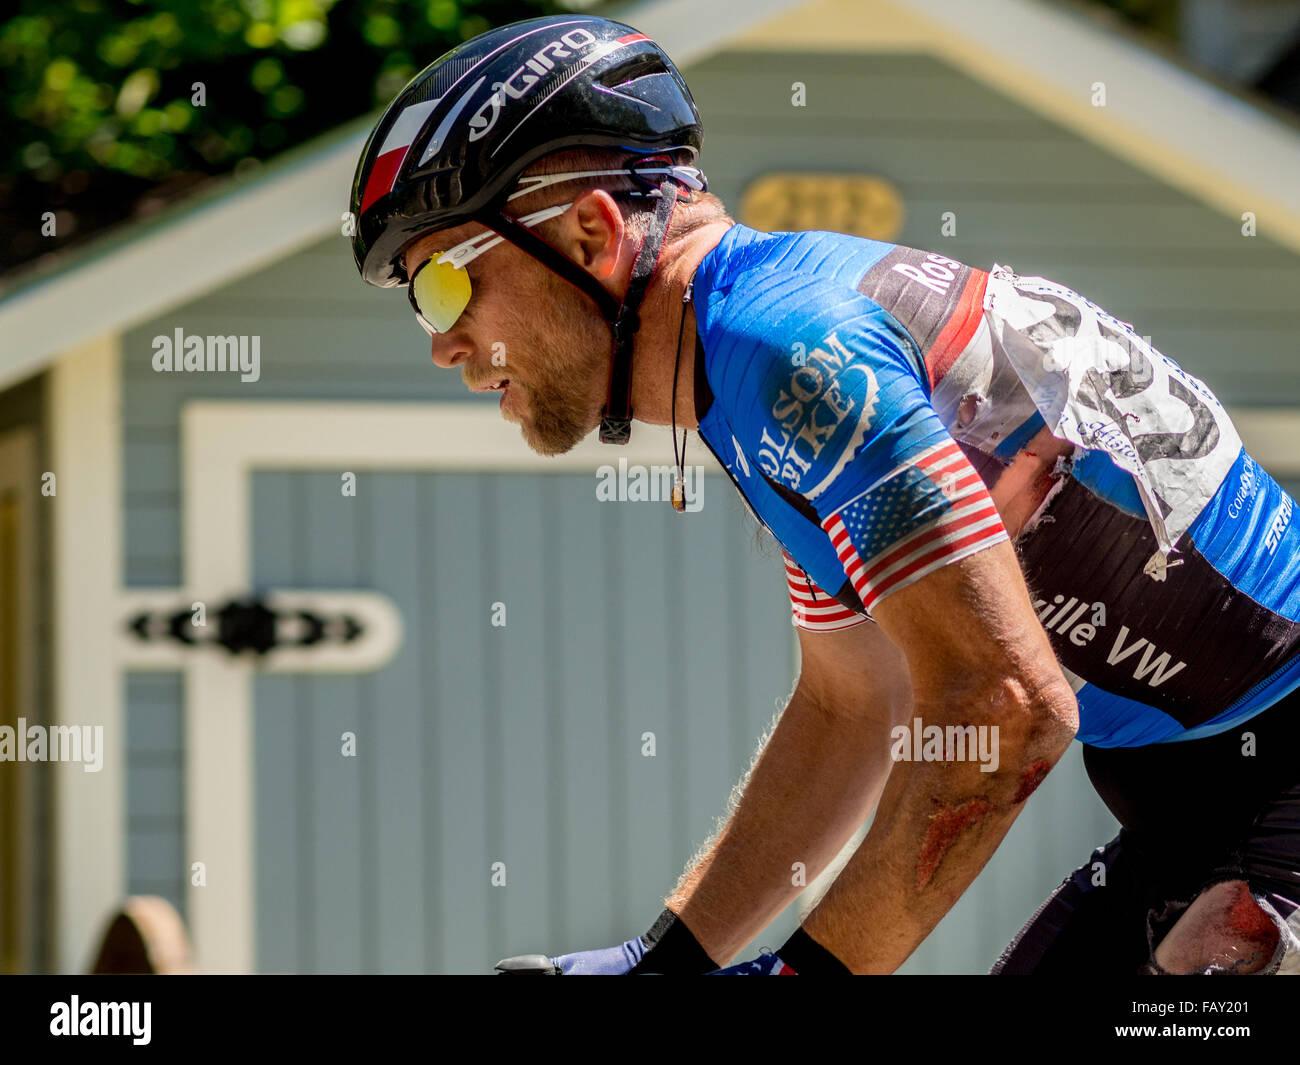 NEVADA CITY, USA - JUNE 14, 2014: Master's age group athlete rides despite injury after crashing in cycling - Stock Image